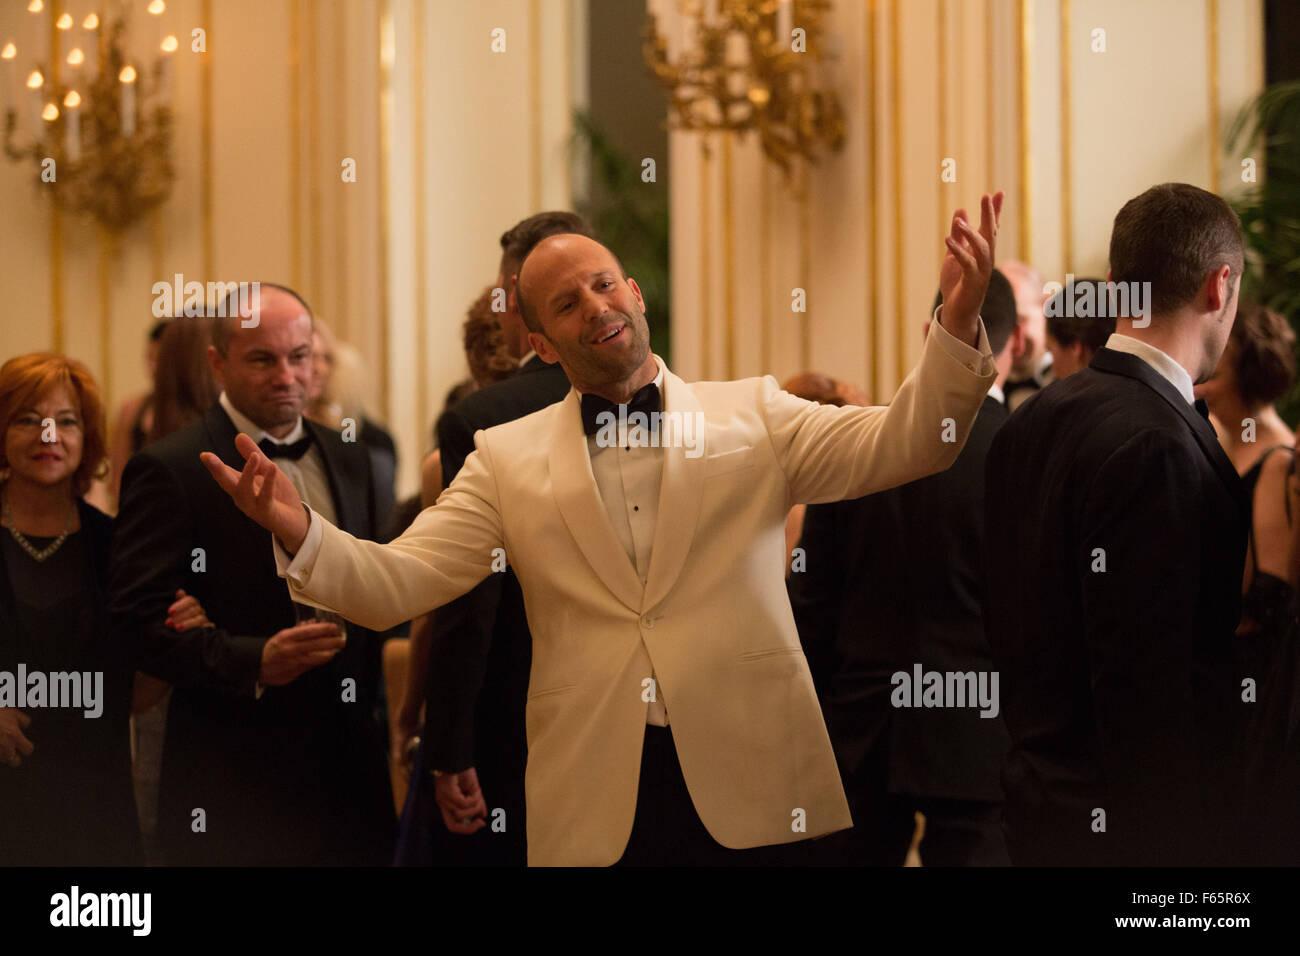 Spy Year : 2015 USA Director : Paul Feig Jason Statham - Stock Image